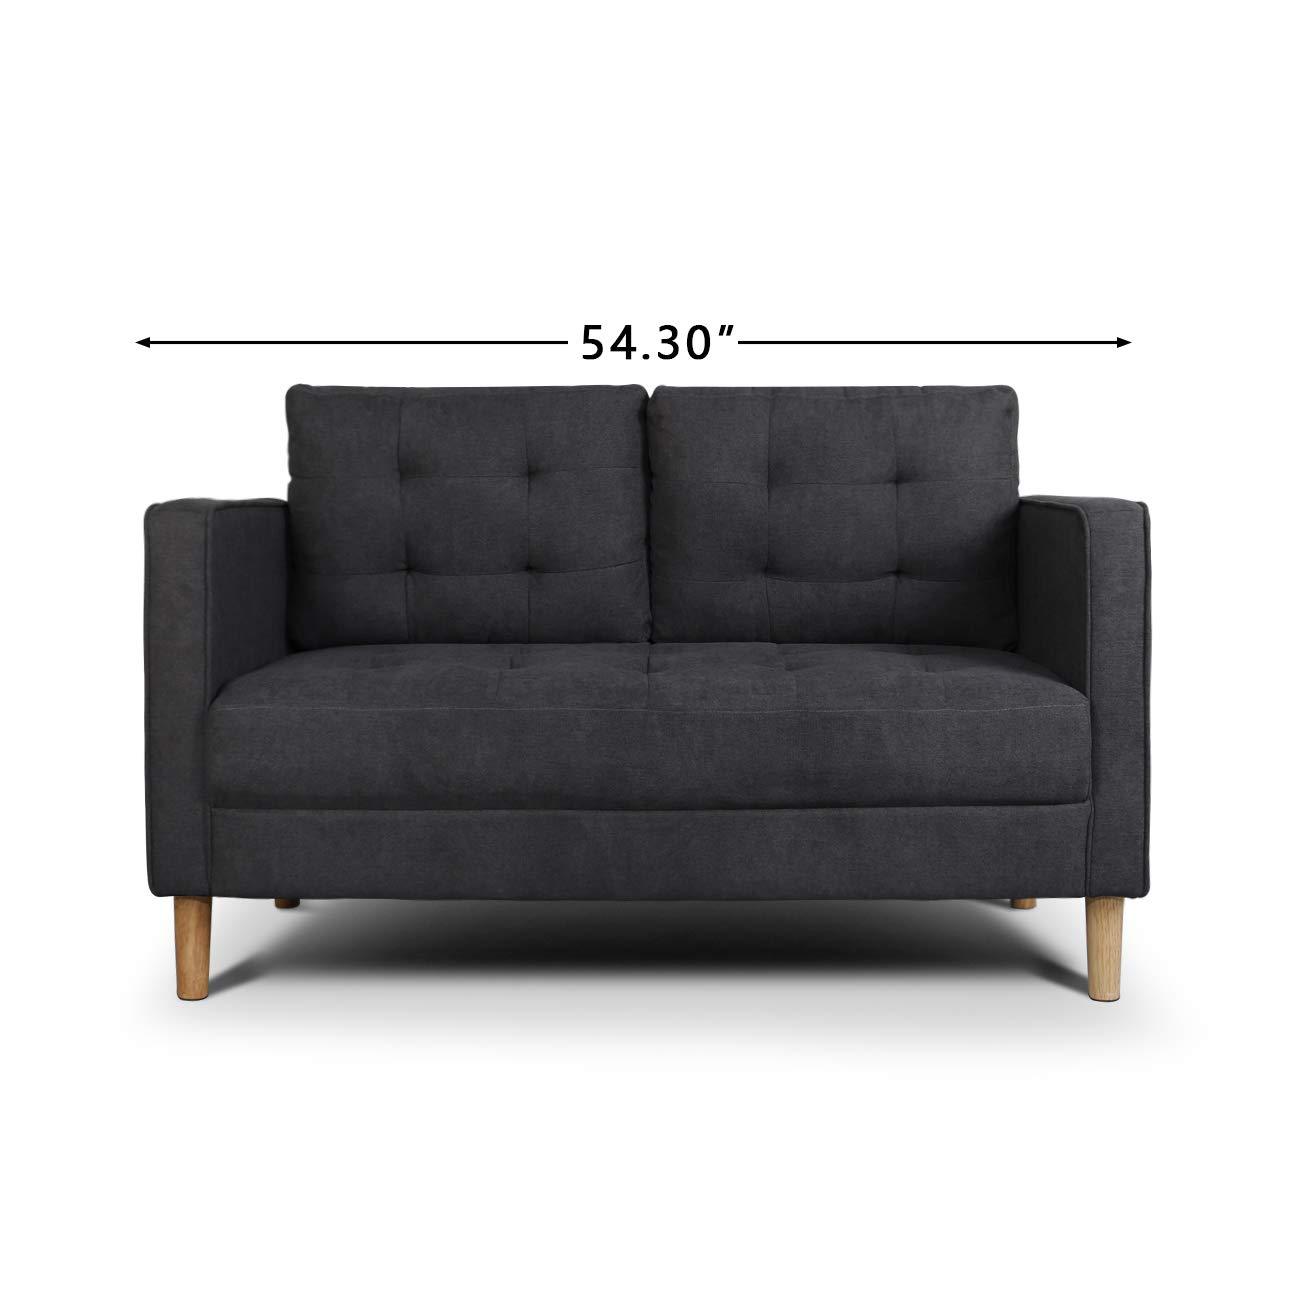 AODAILIHB Modern Cushion Loveseat Configurable